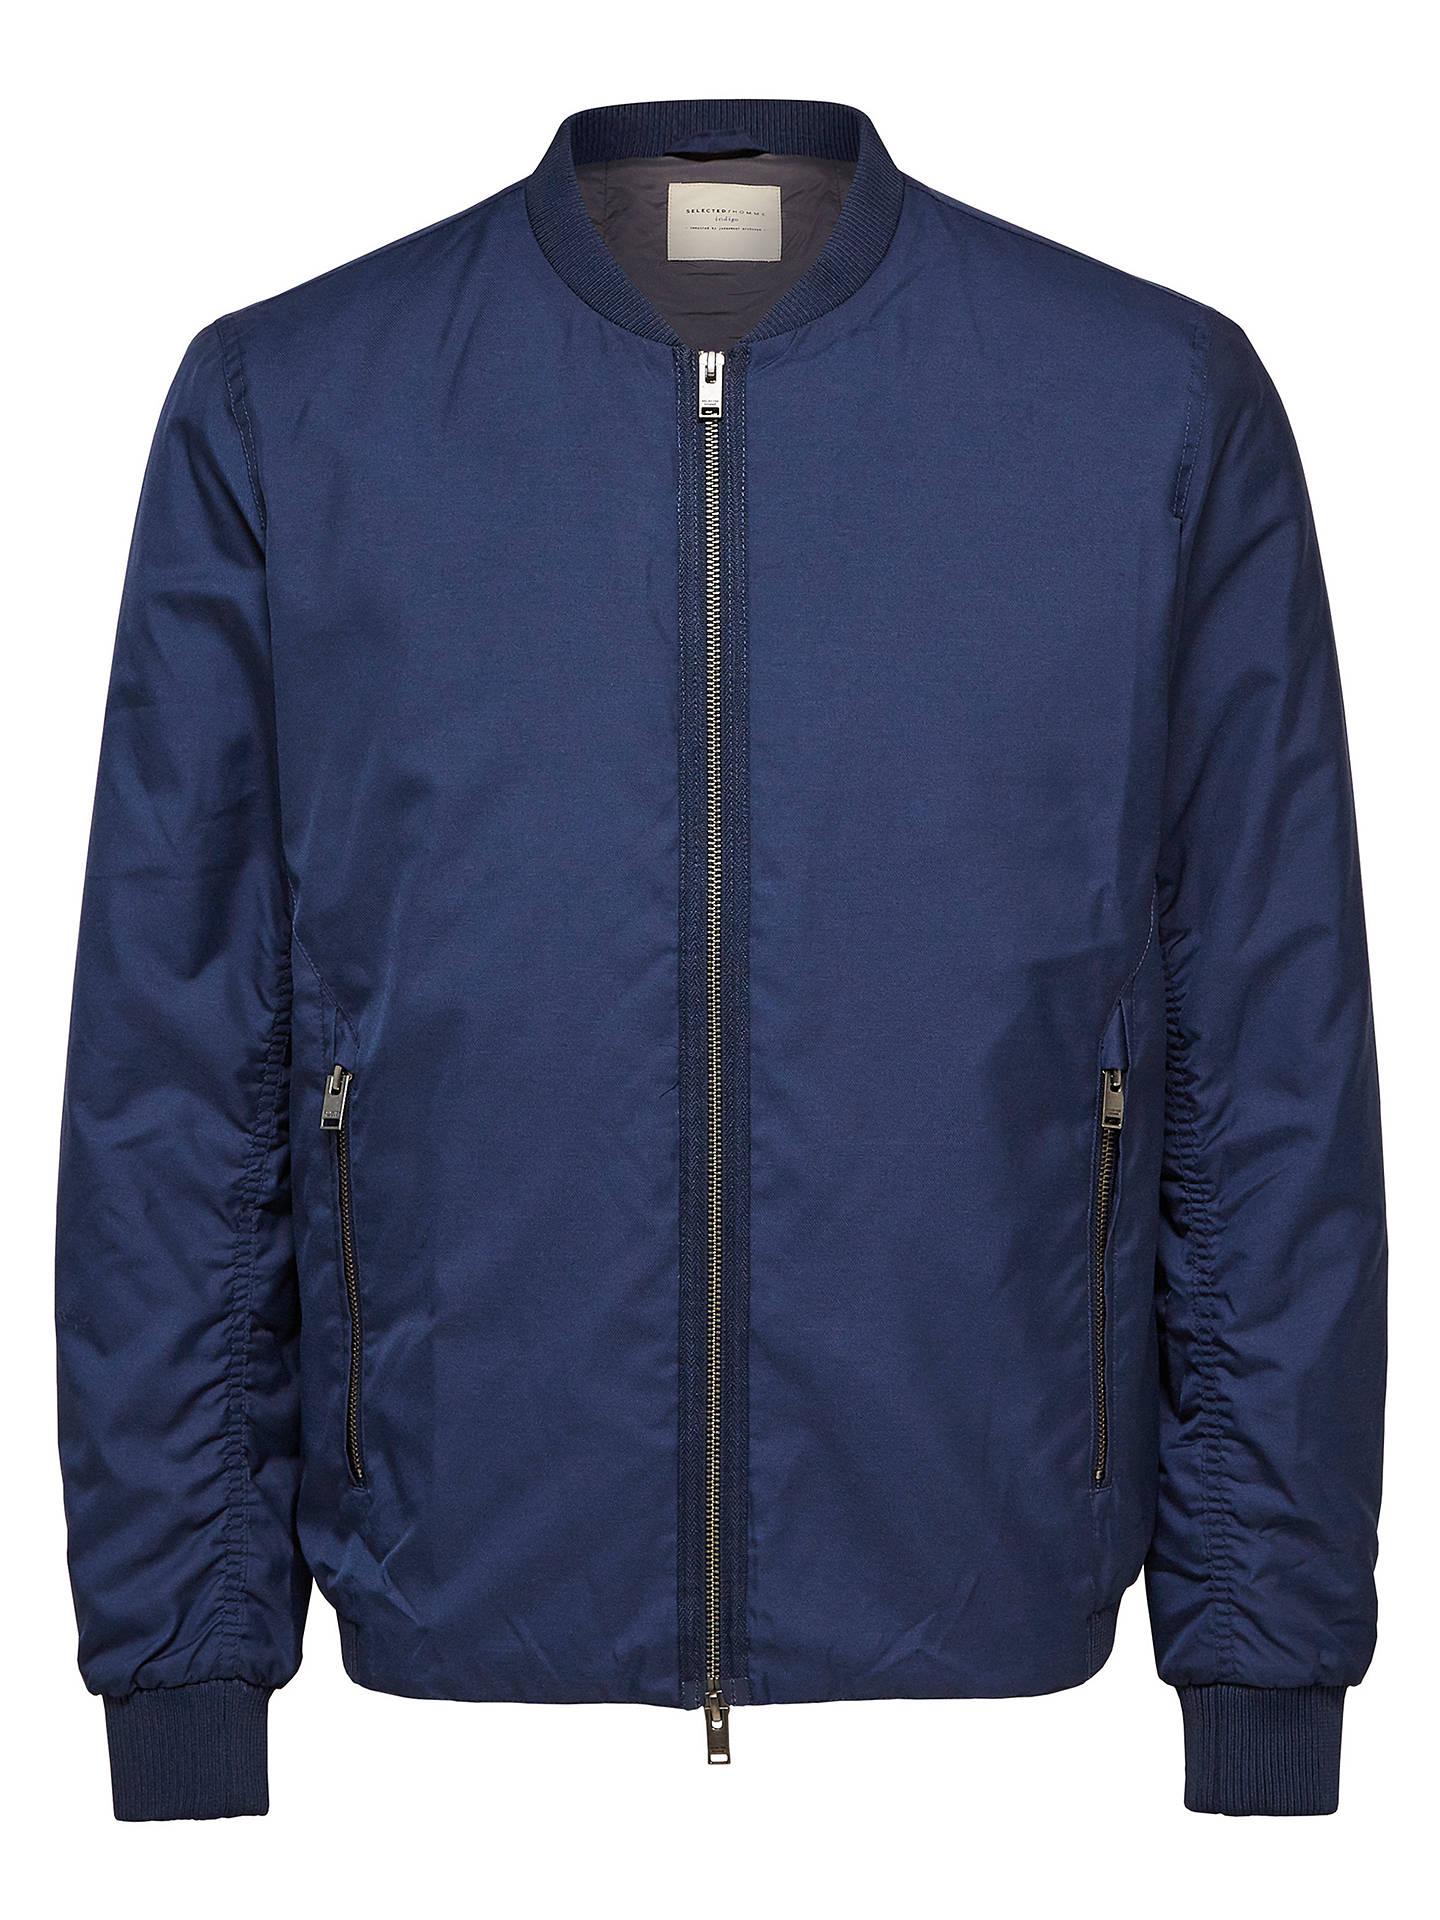 2c84f07d Selected Homme Classic Bomber Jacket, Dark Blue Melange at John ...